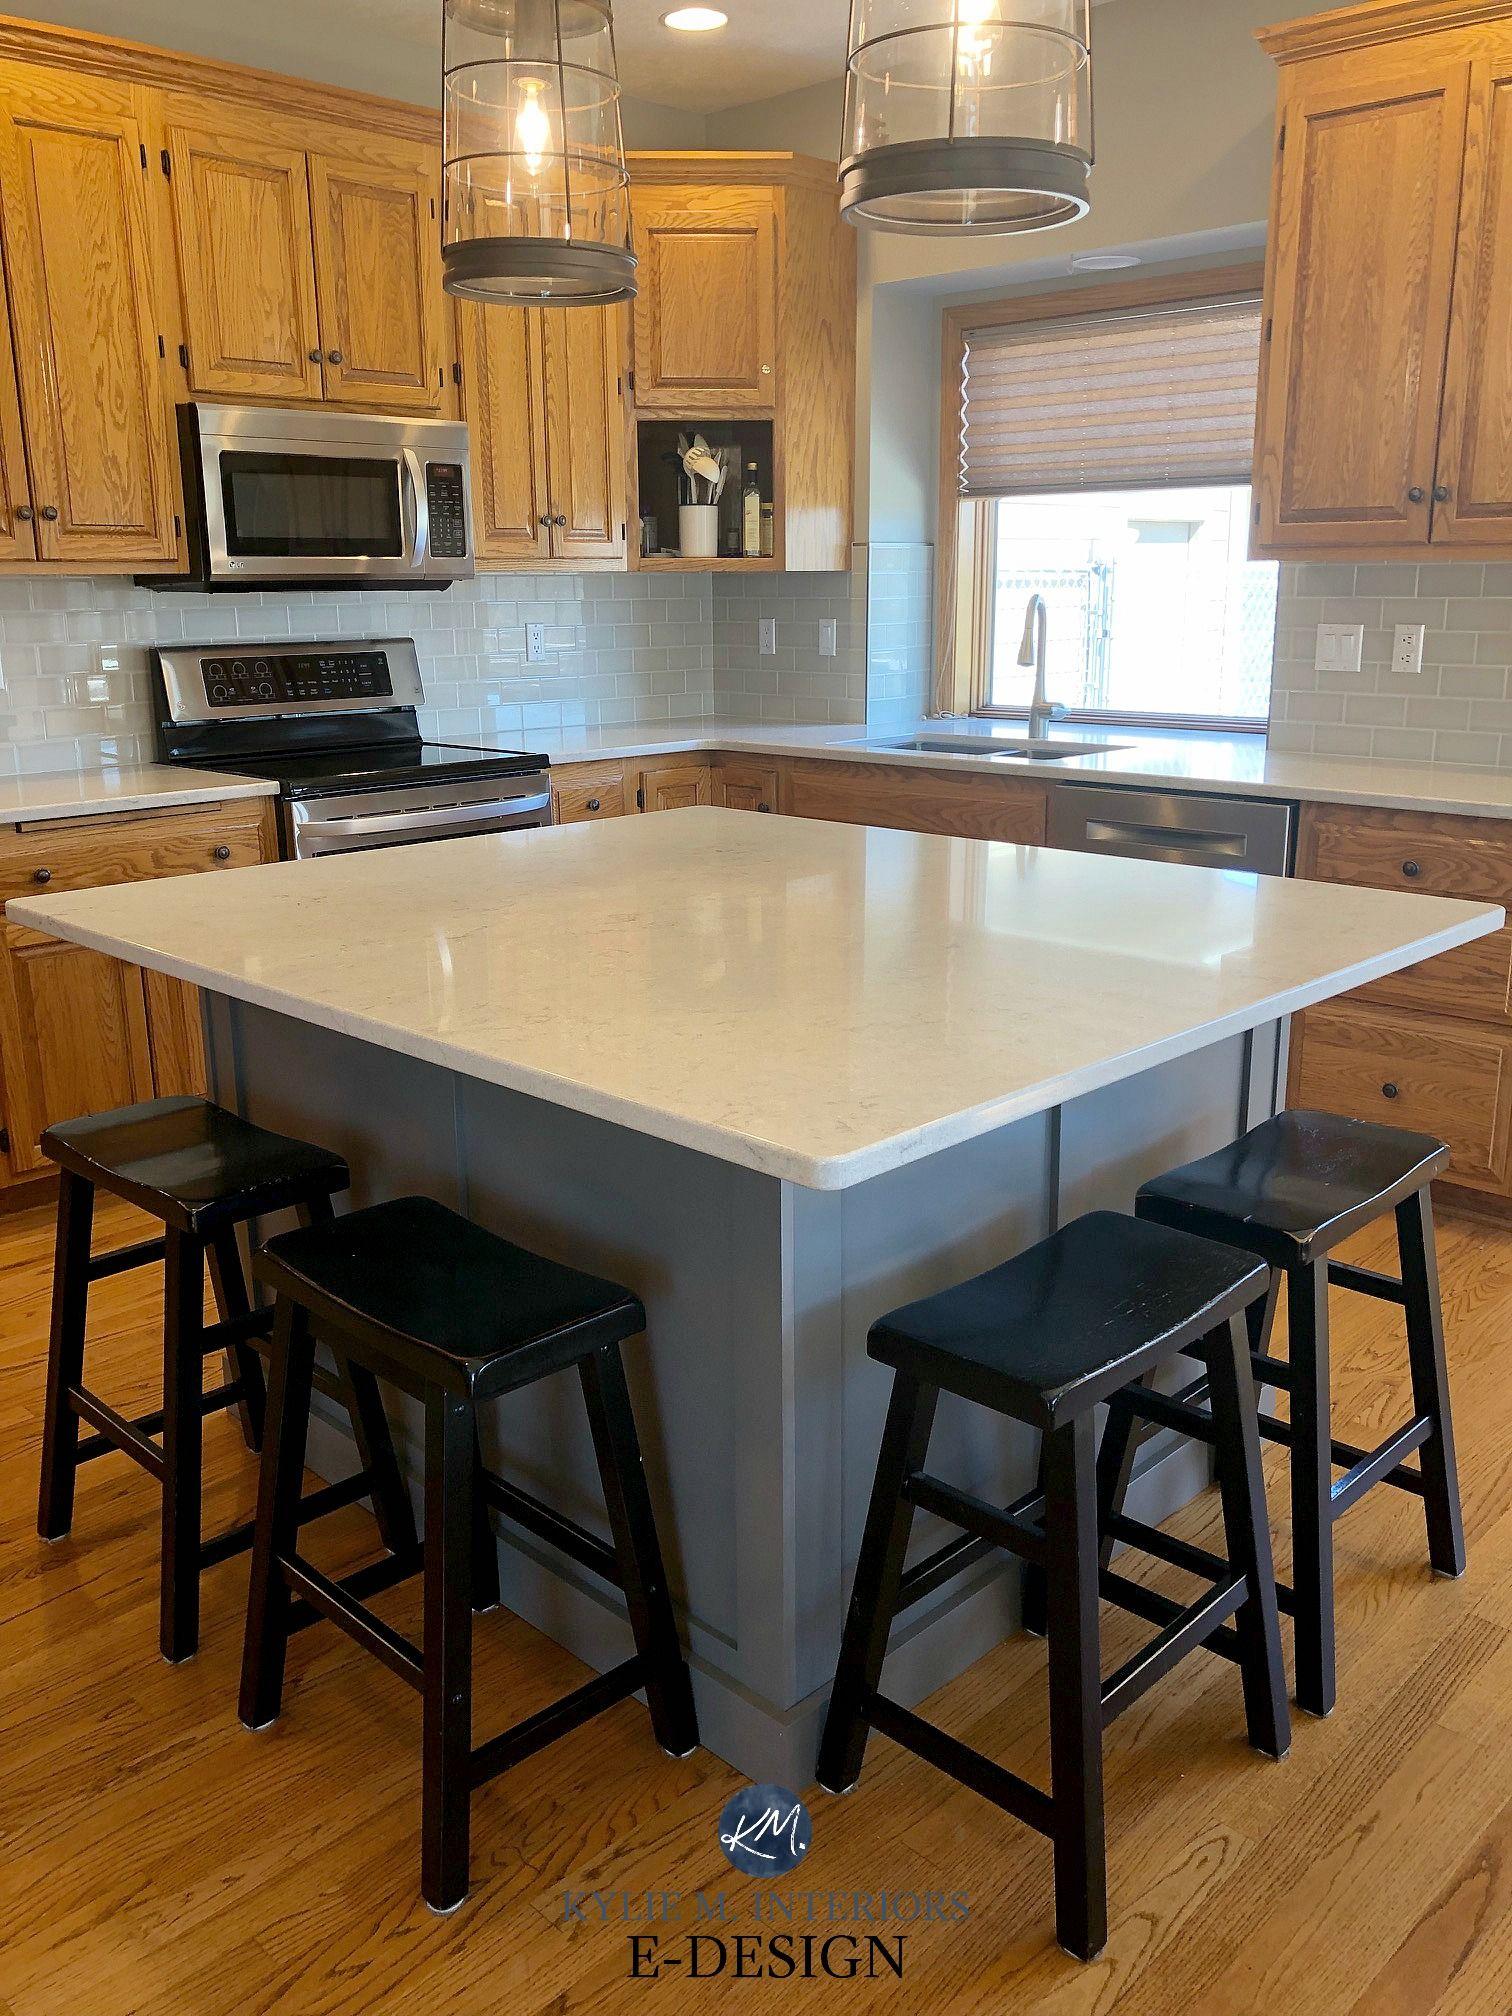 E Design 3 Painted Oak Maple Kitchen Cabinet Projects Kitchen Cabinet Design Kitchen Flooring Maple Kitchen Cabinets